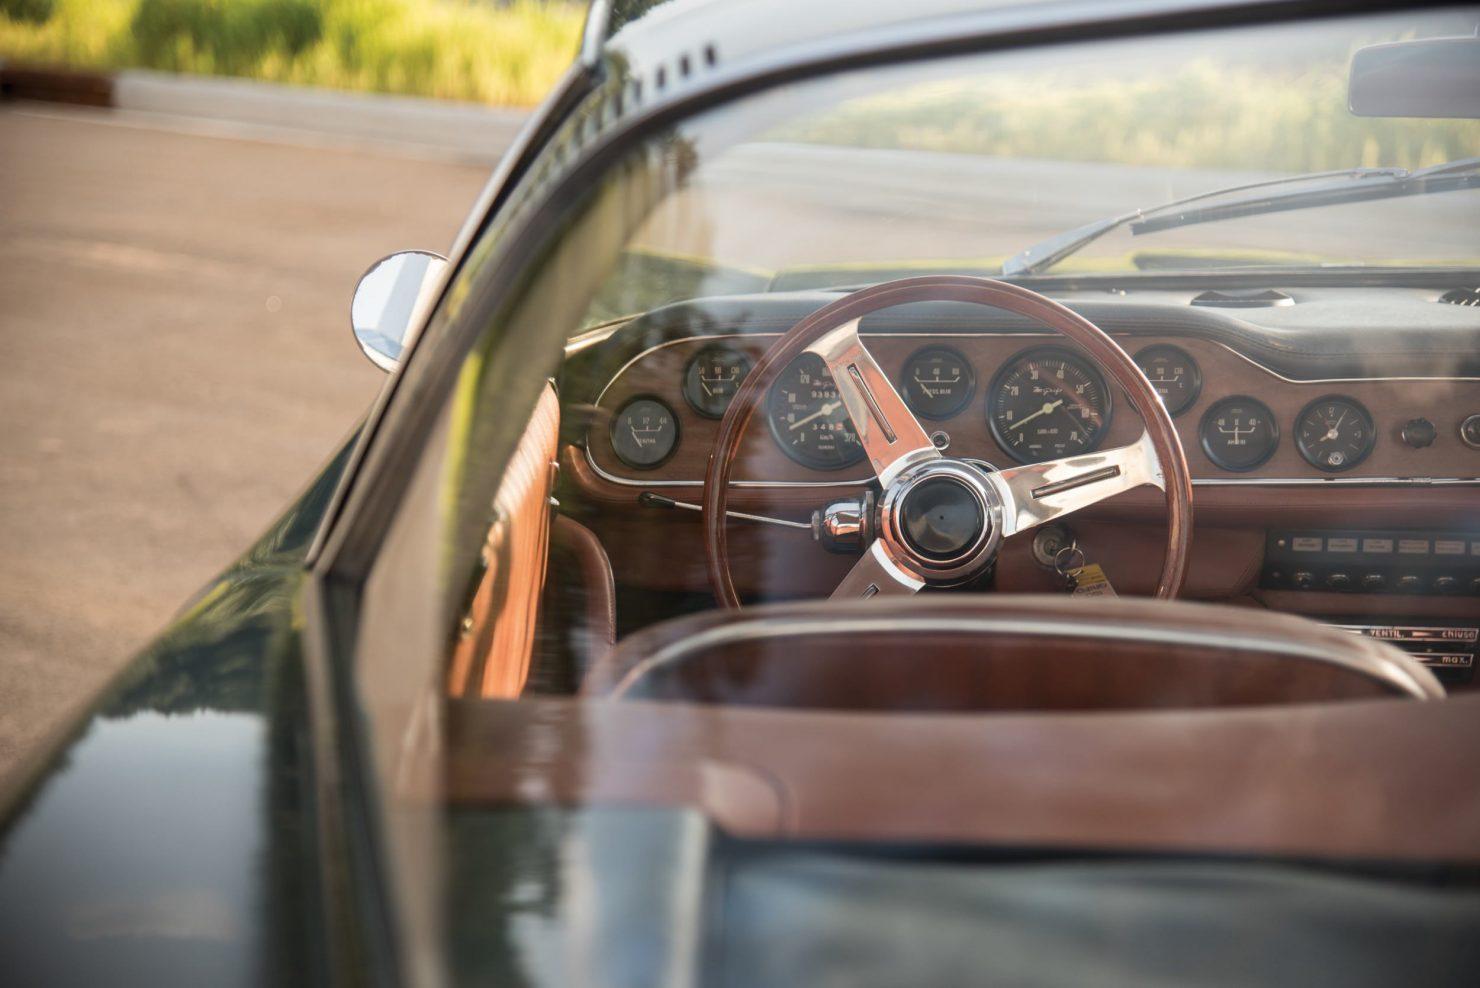 iso grifo car 17 1480x988 - 1966 Iso Grifo GL Series I